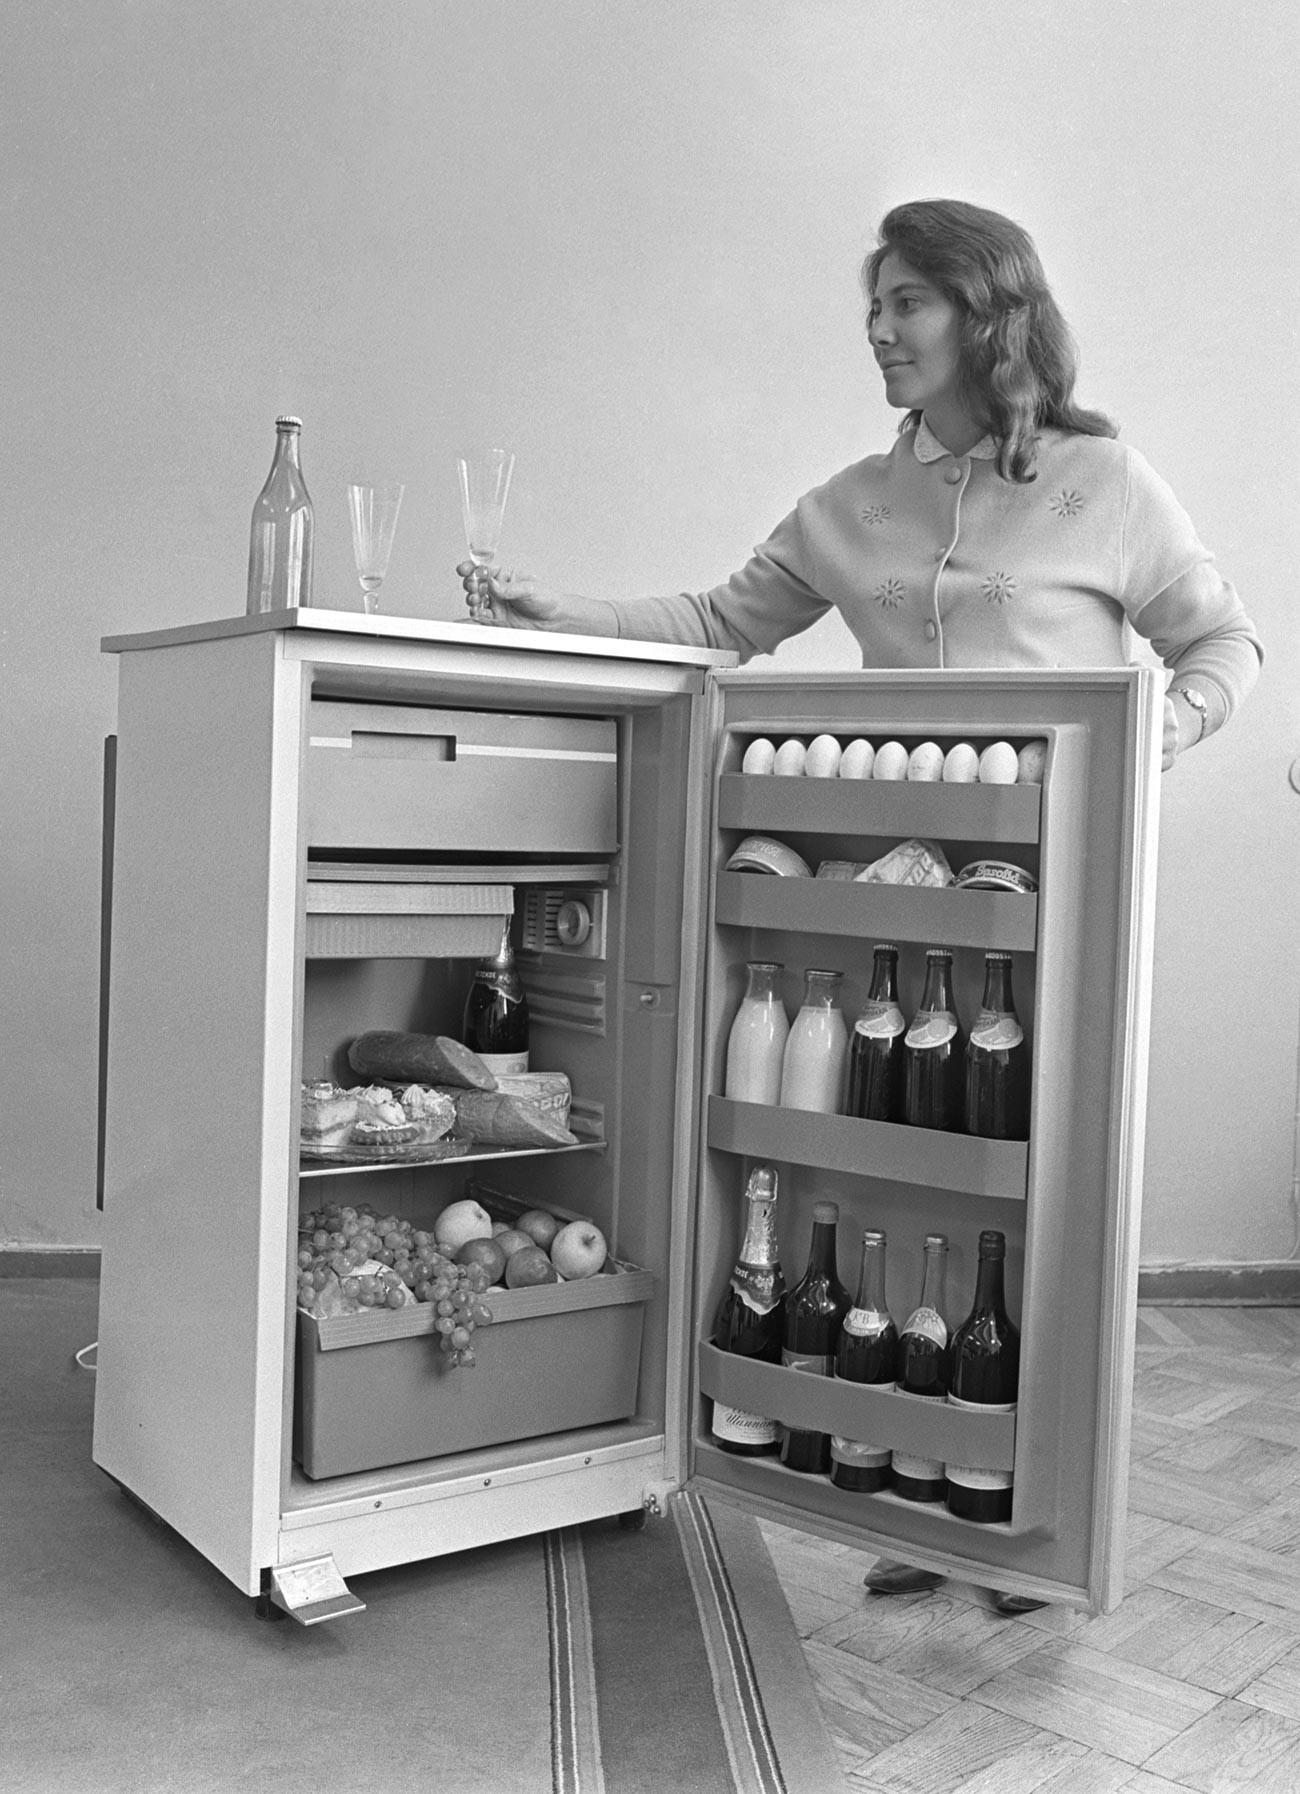 Chisinau refrigerator plant, 1970